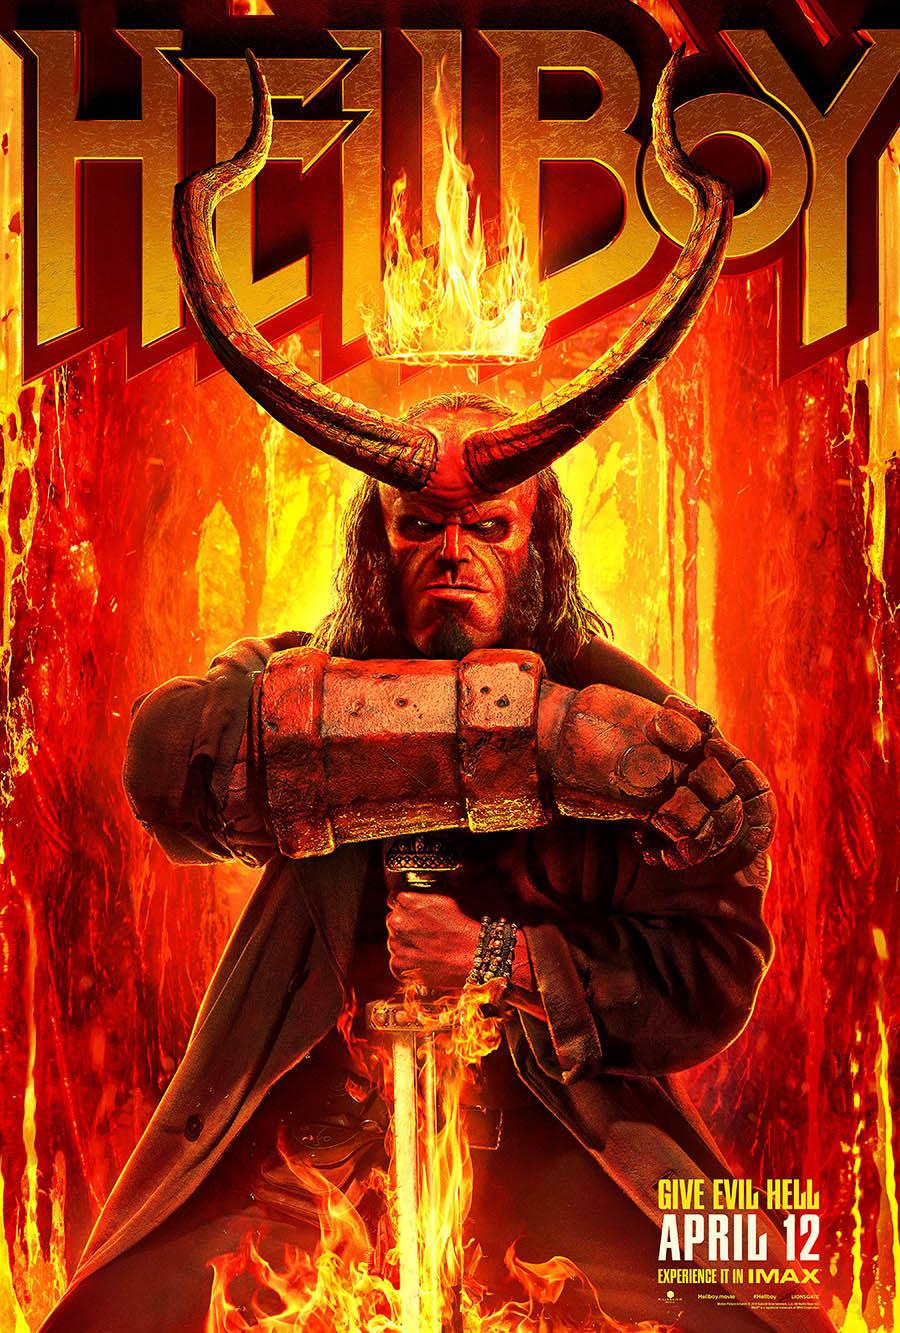 Hellboy 2019 Fandango